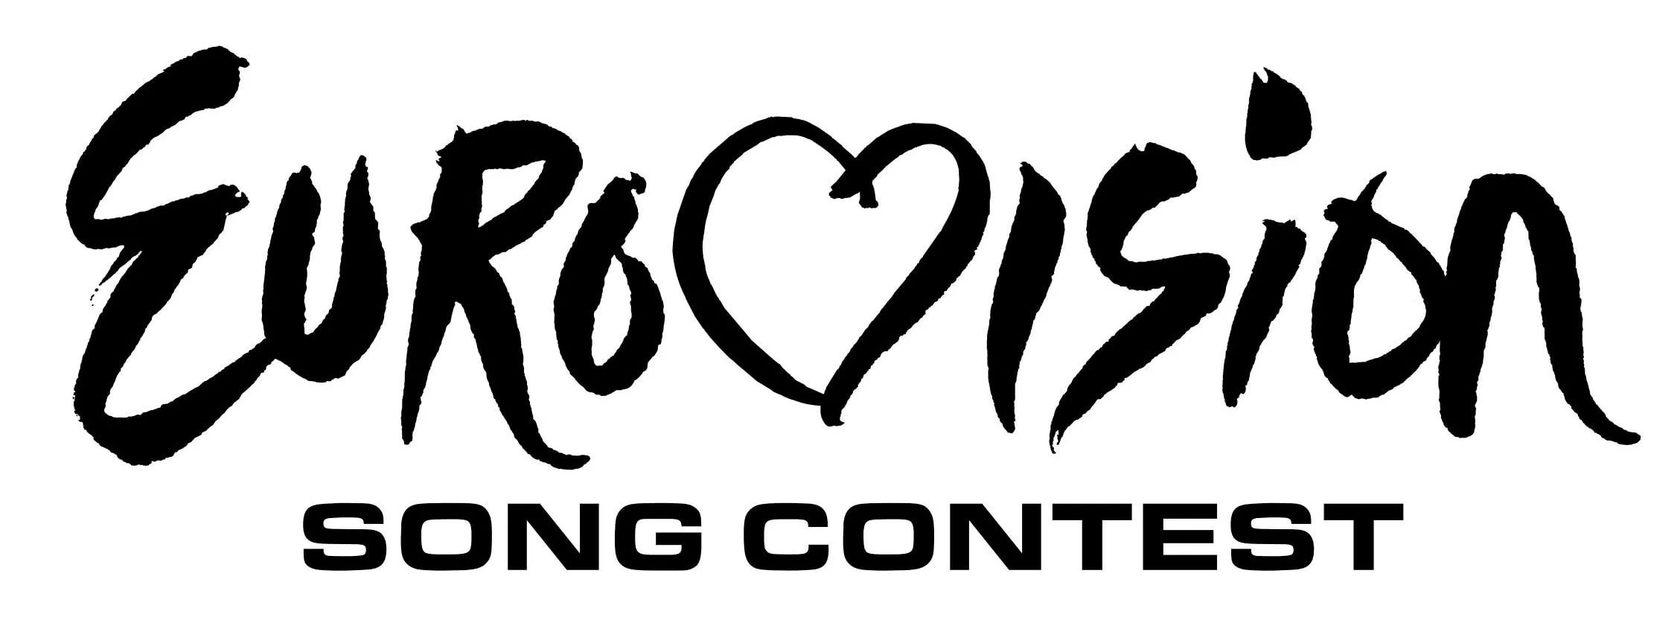 Беларусь на Евровидении. 2004-2018